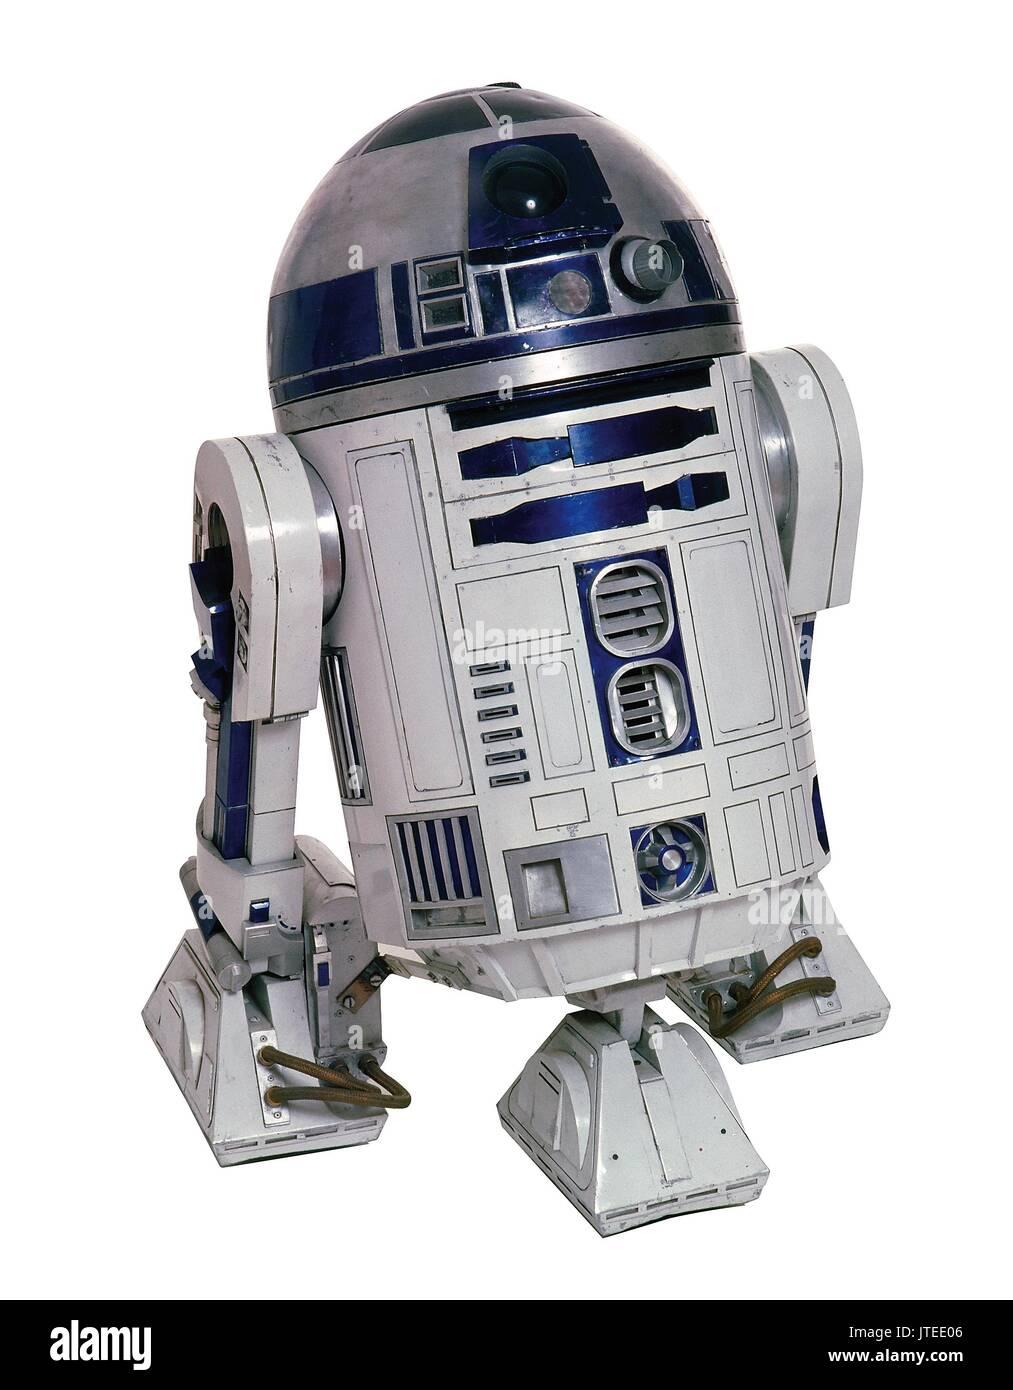 R2-D2 STAR WARS; STAR WARS: EPISODE IV - A NEW HOPE (1977) - Stock Image